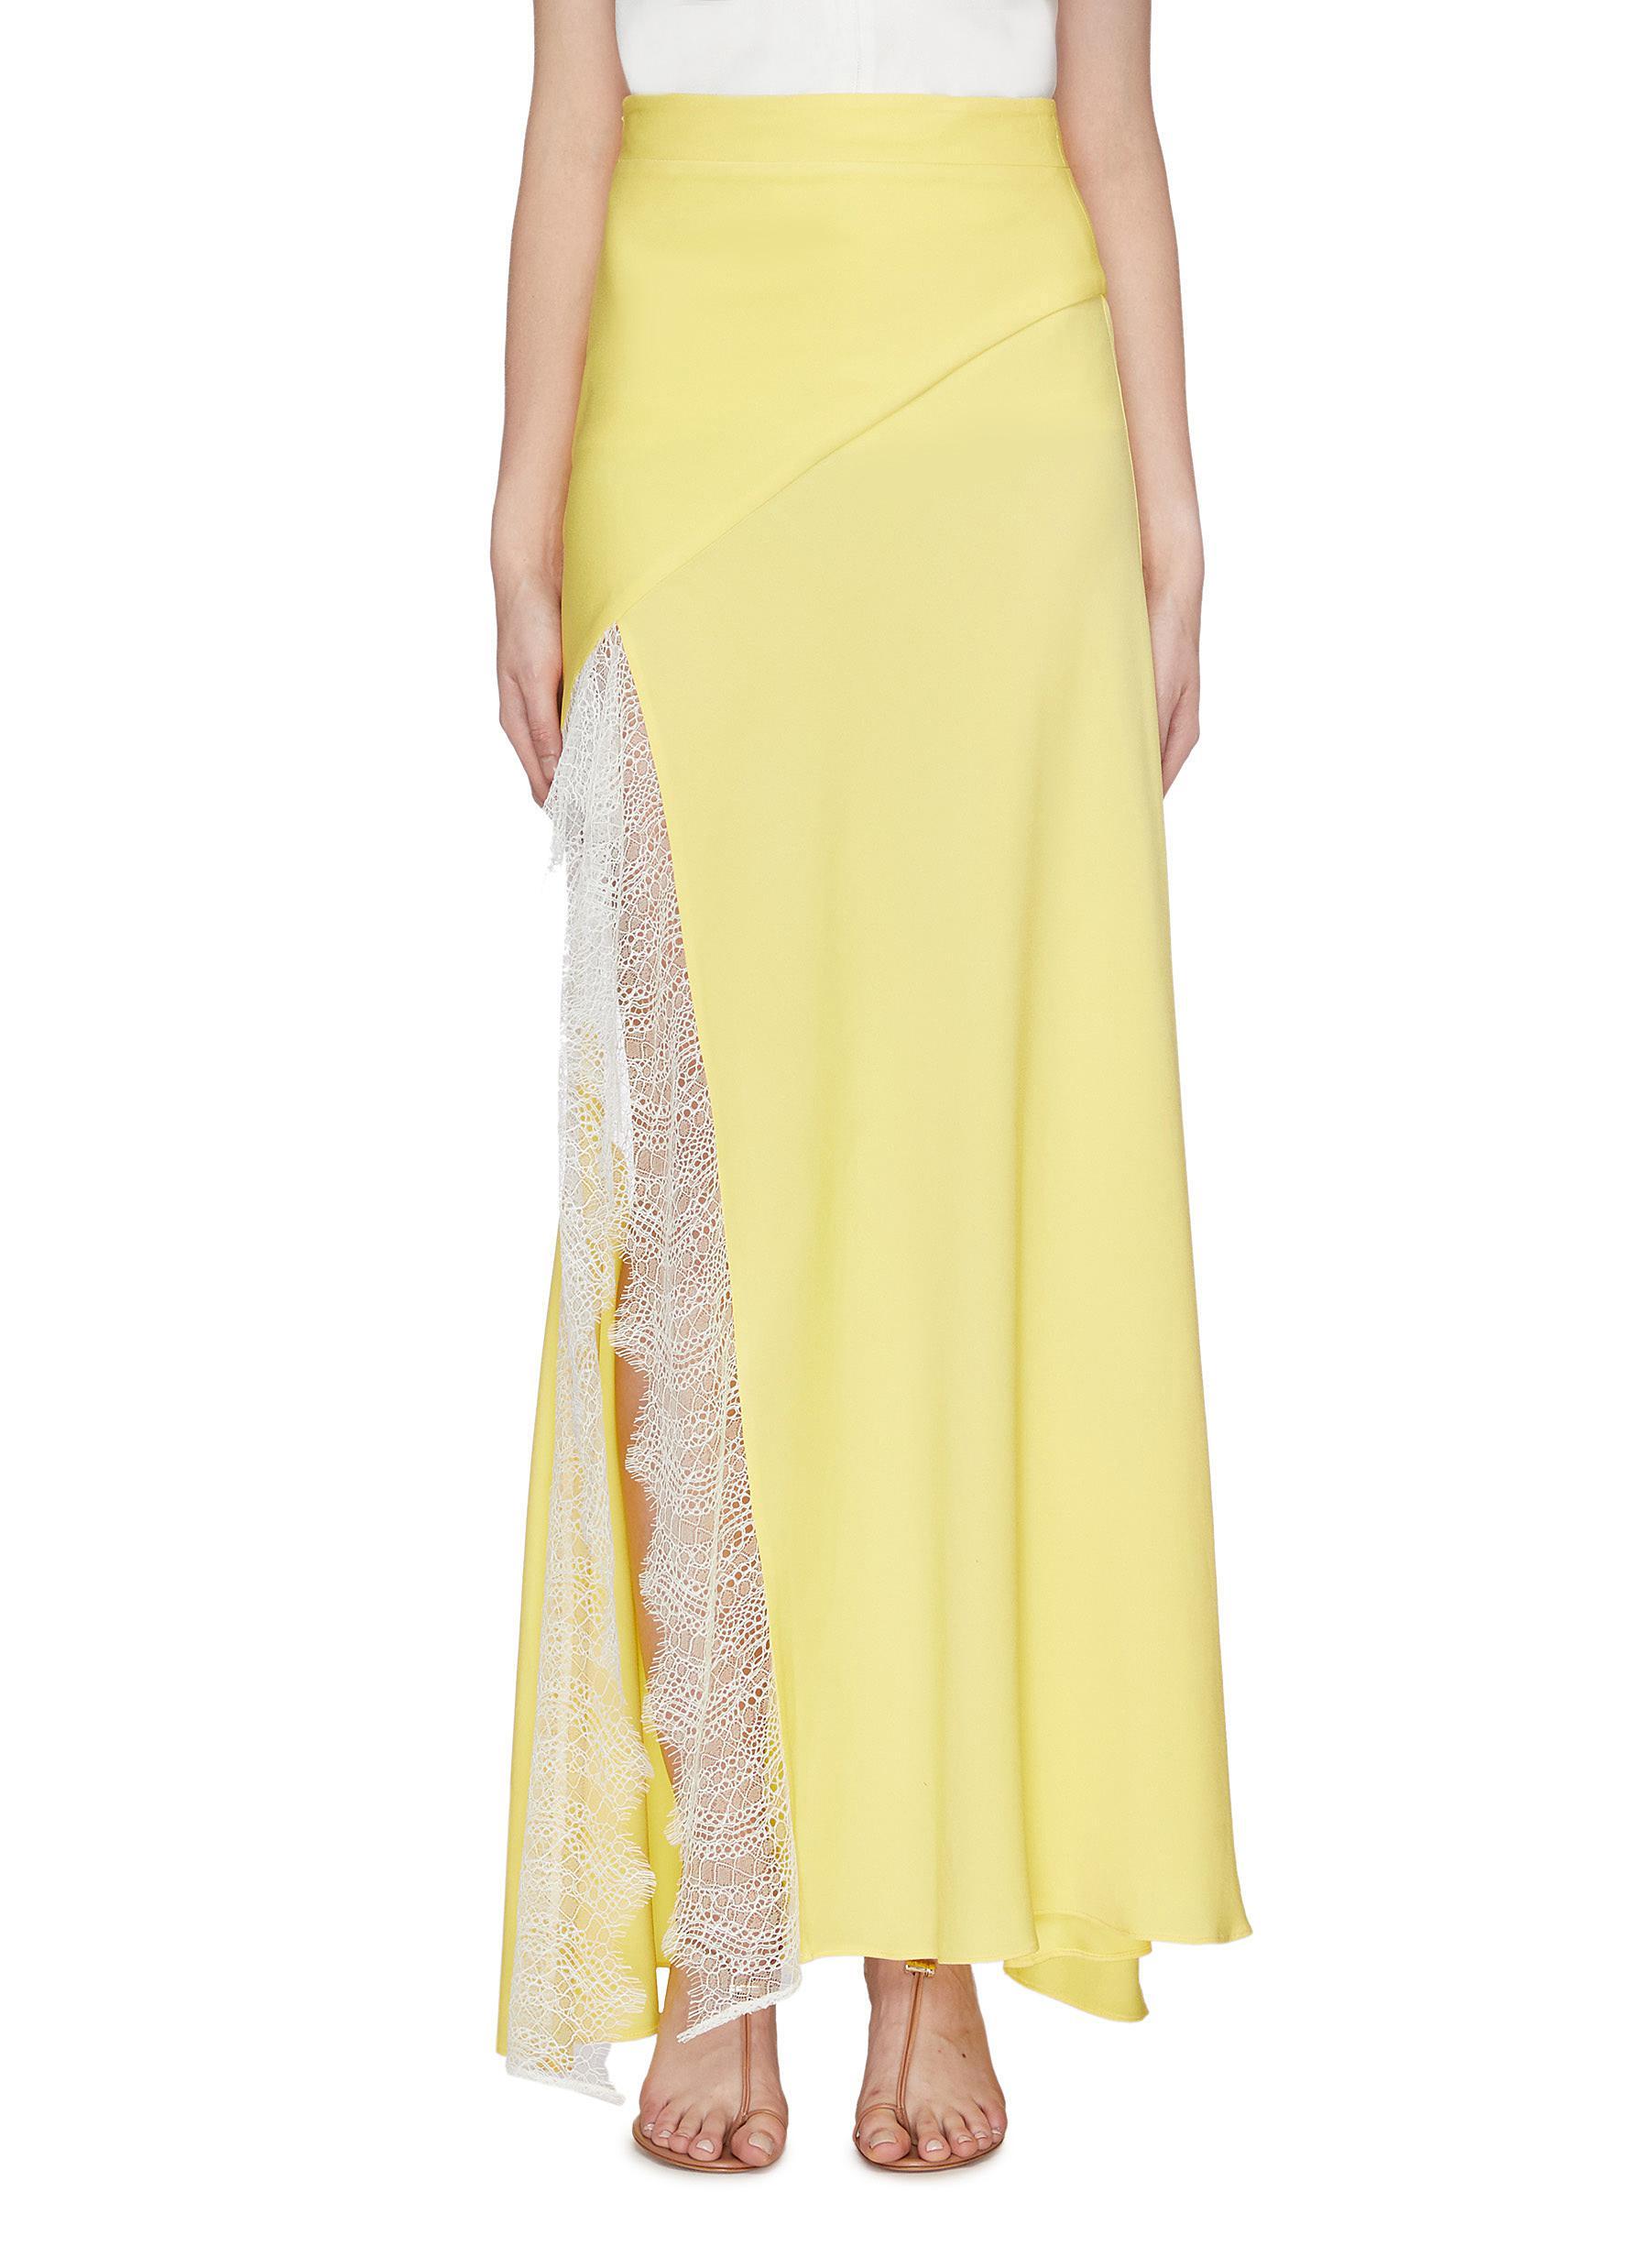 Lace trim split hem satin skirt by Christopher Esber